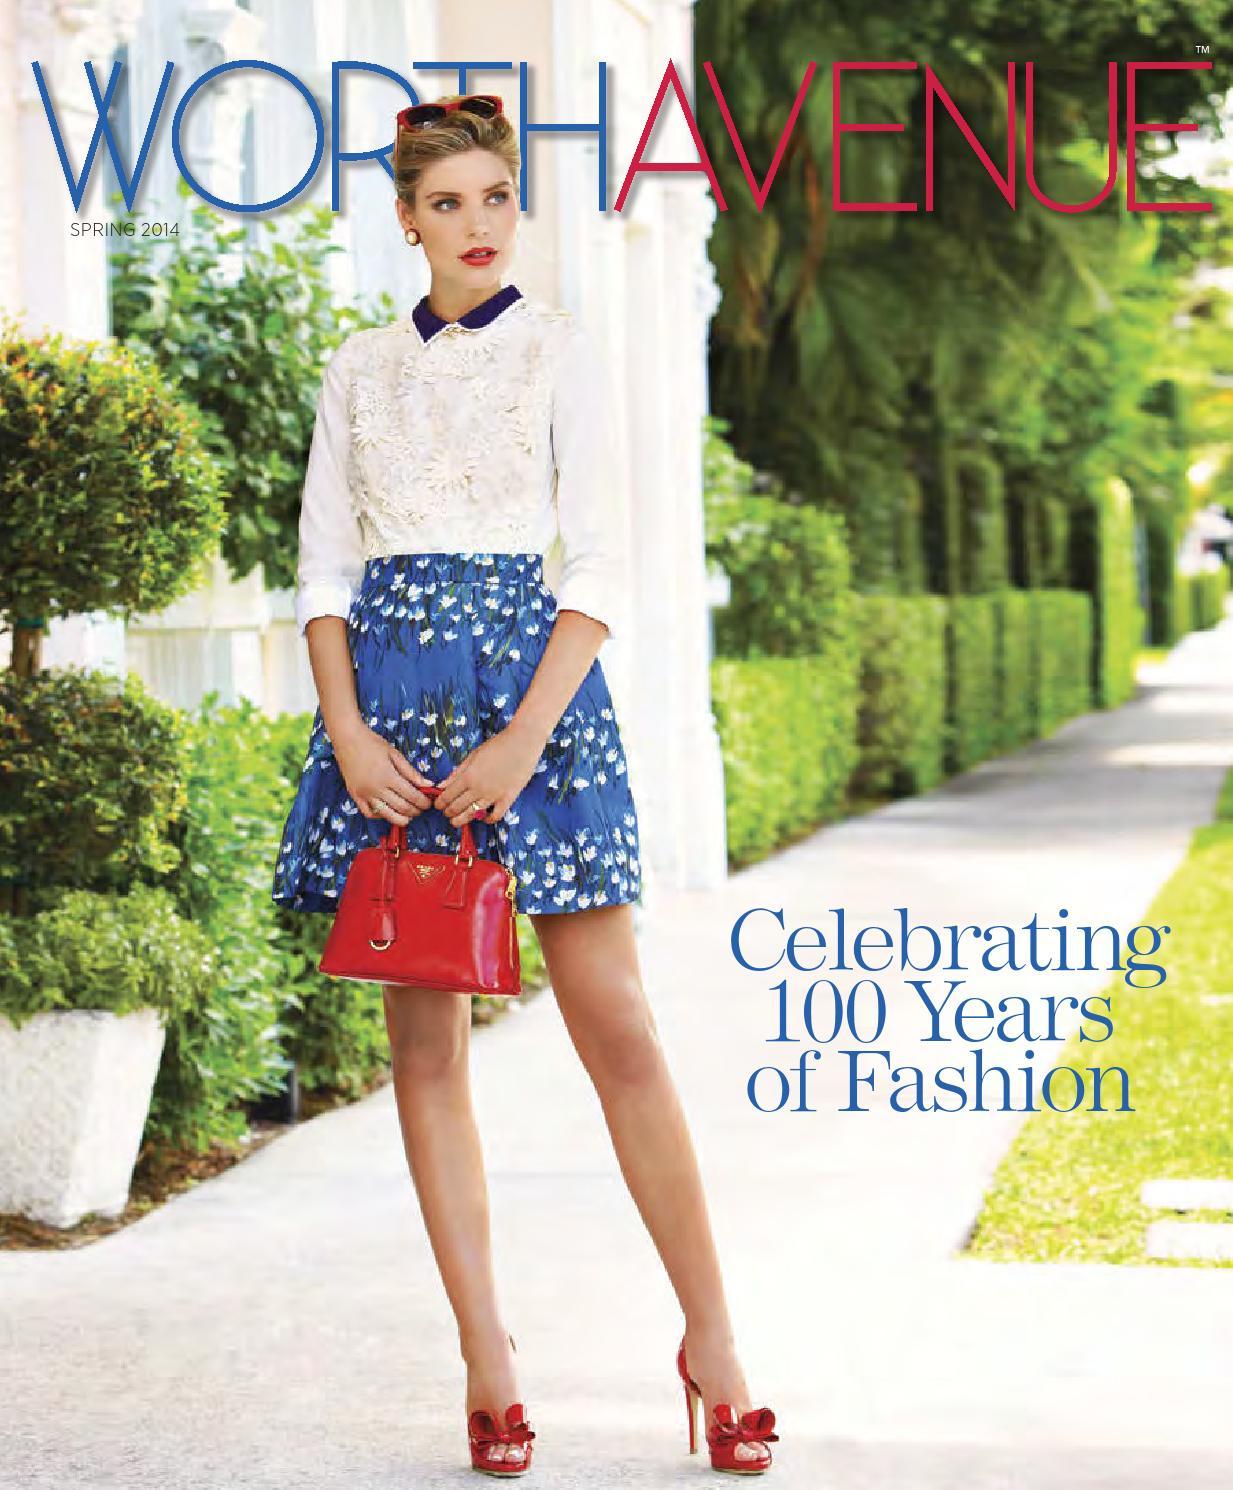 3a33d9095ad5 Worth Avenue magazine Spring 2014 by JES Media - issuu